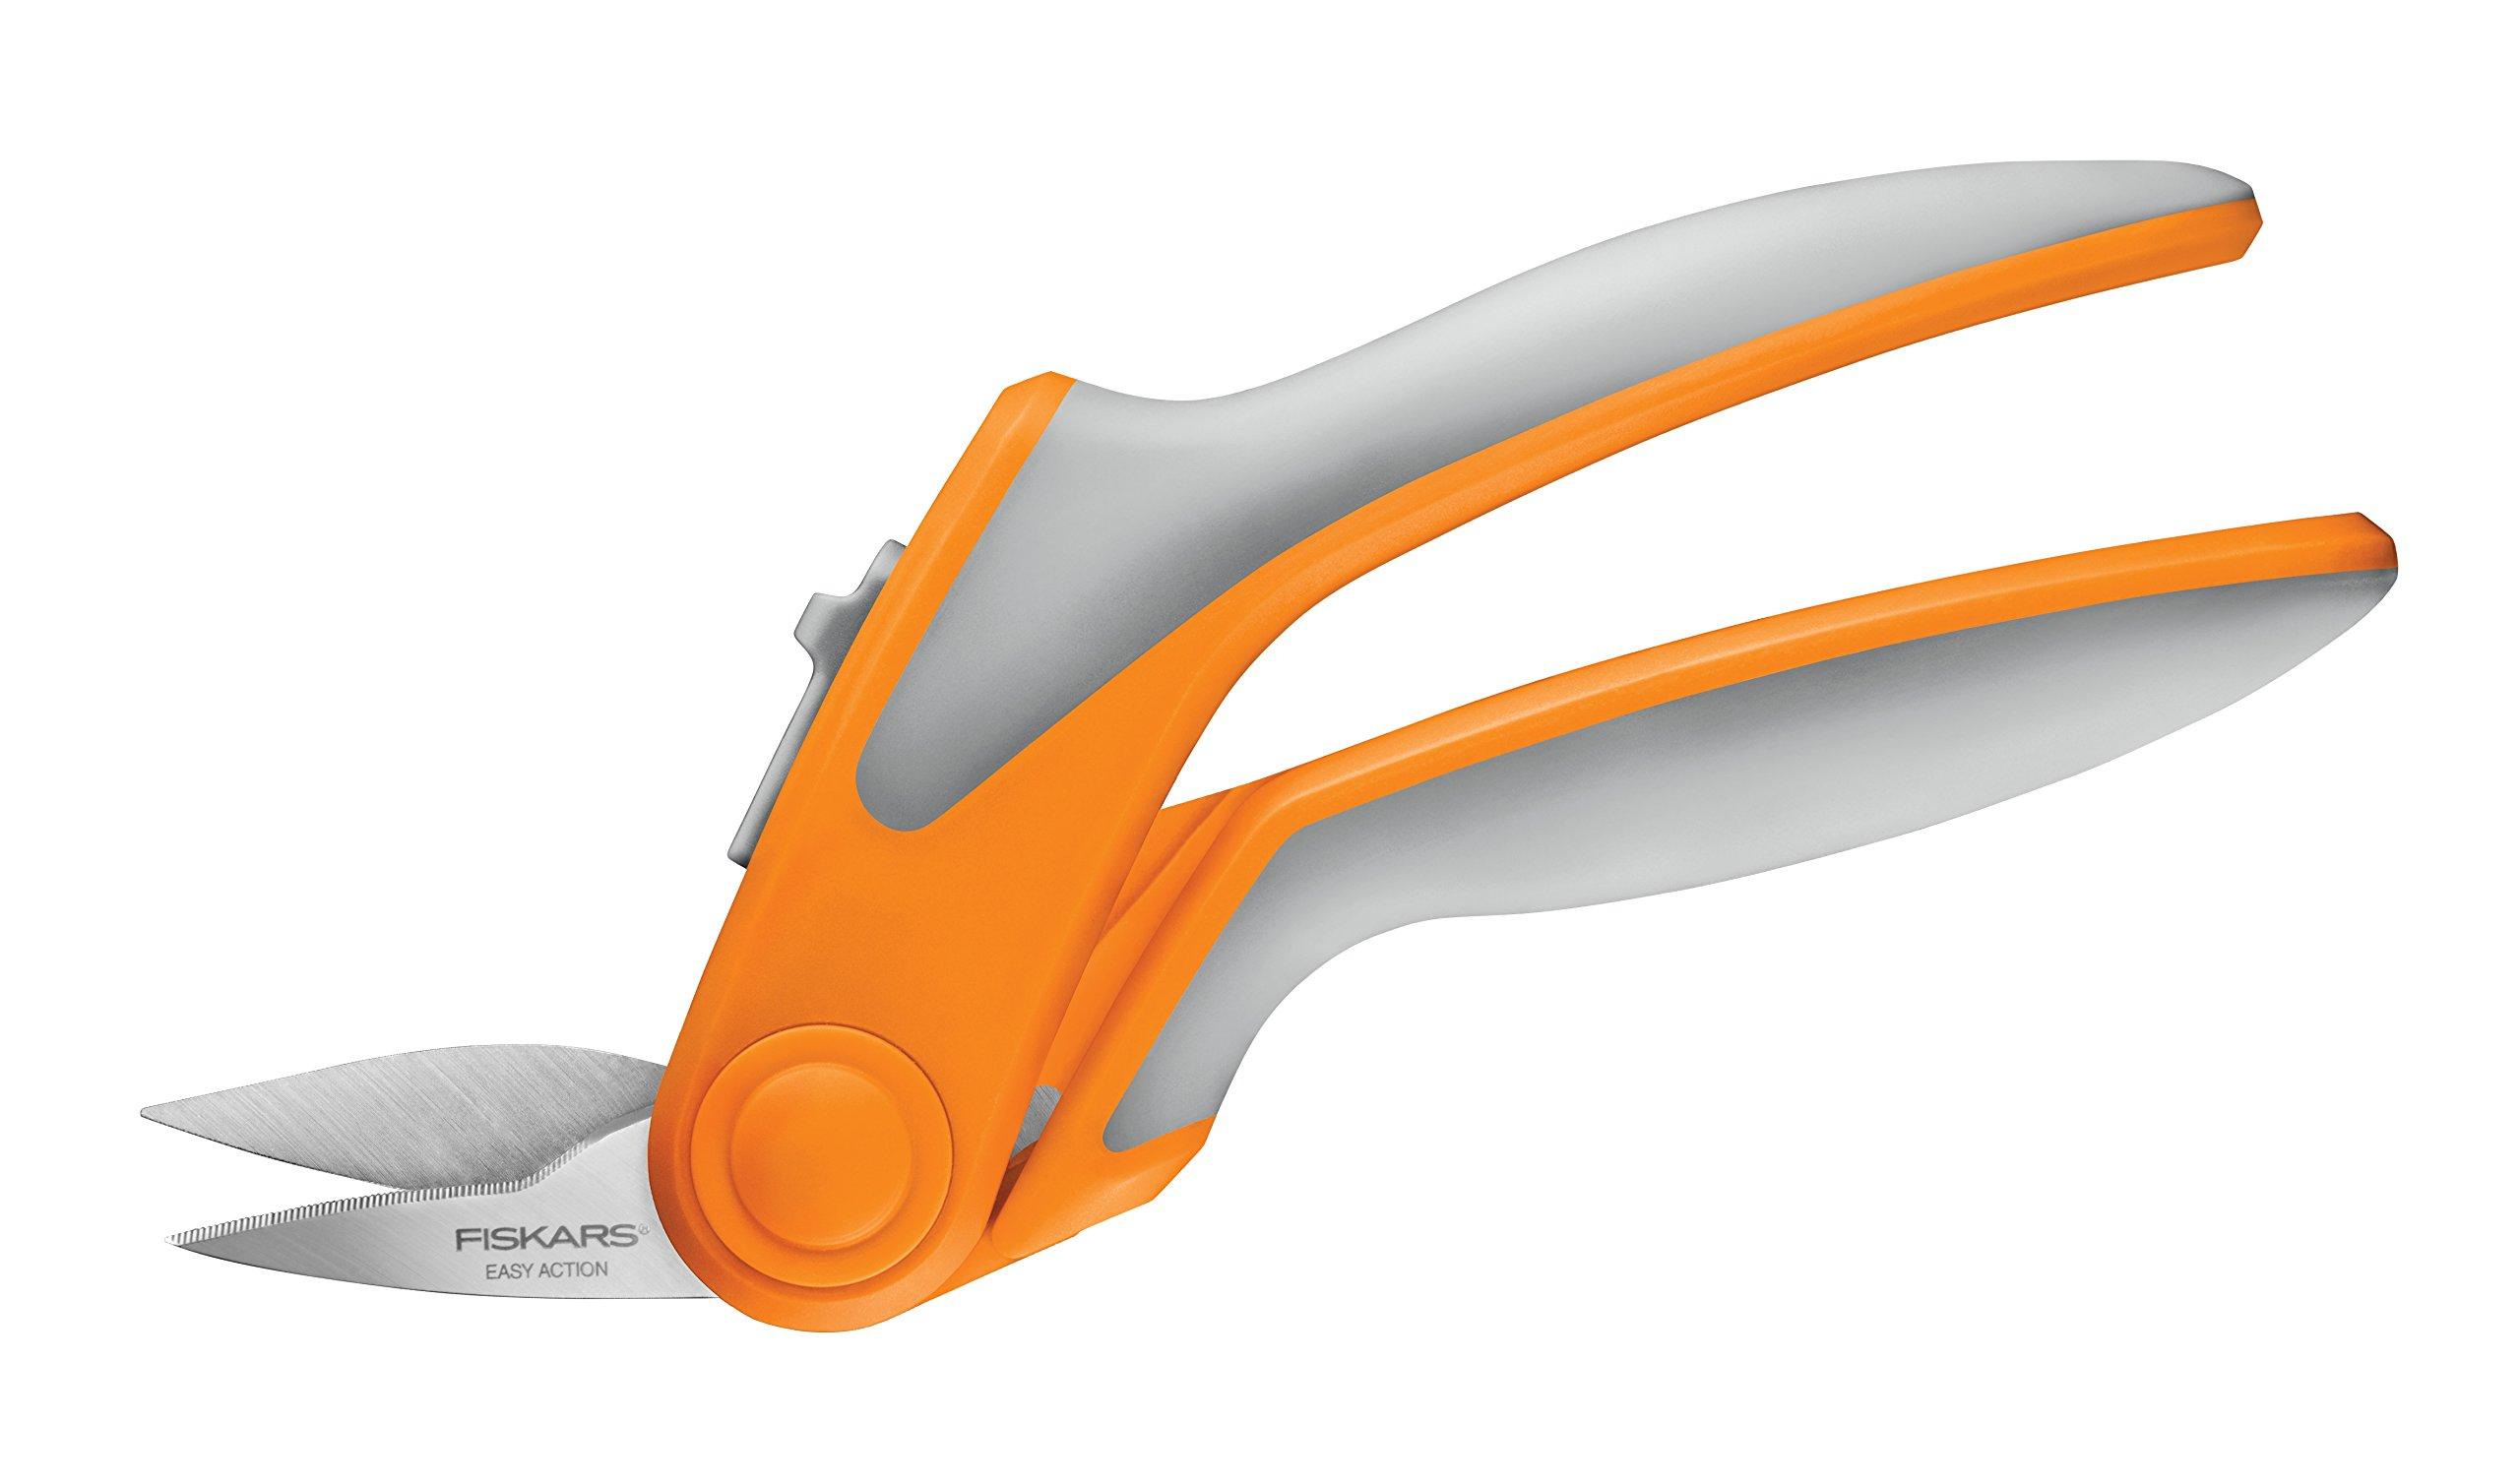 Fiskars 8.5 Inch Softouch Spring Action Rag Quilter Snip by Fiskars